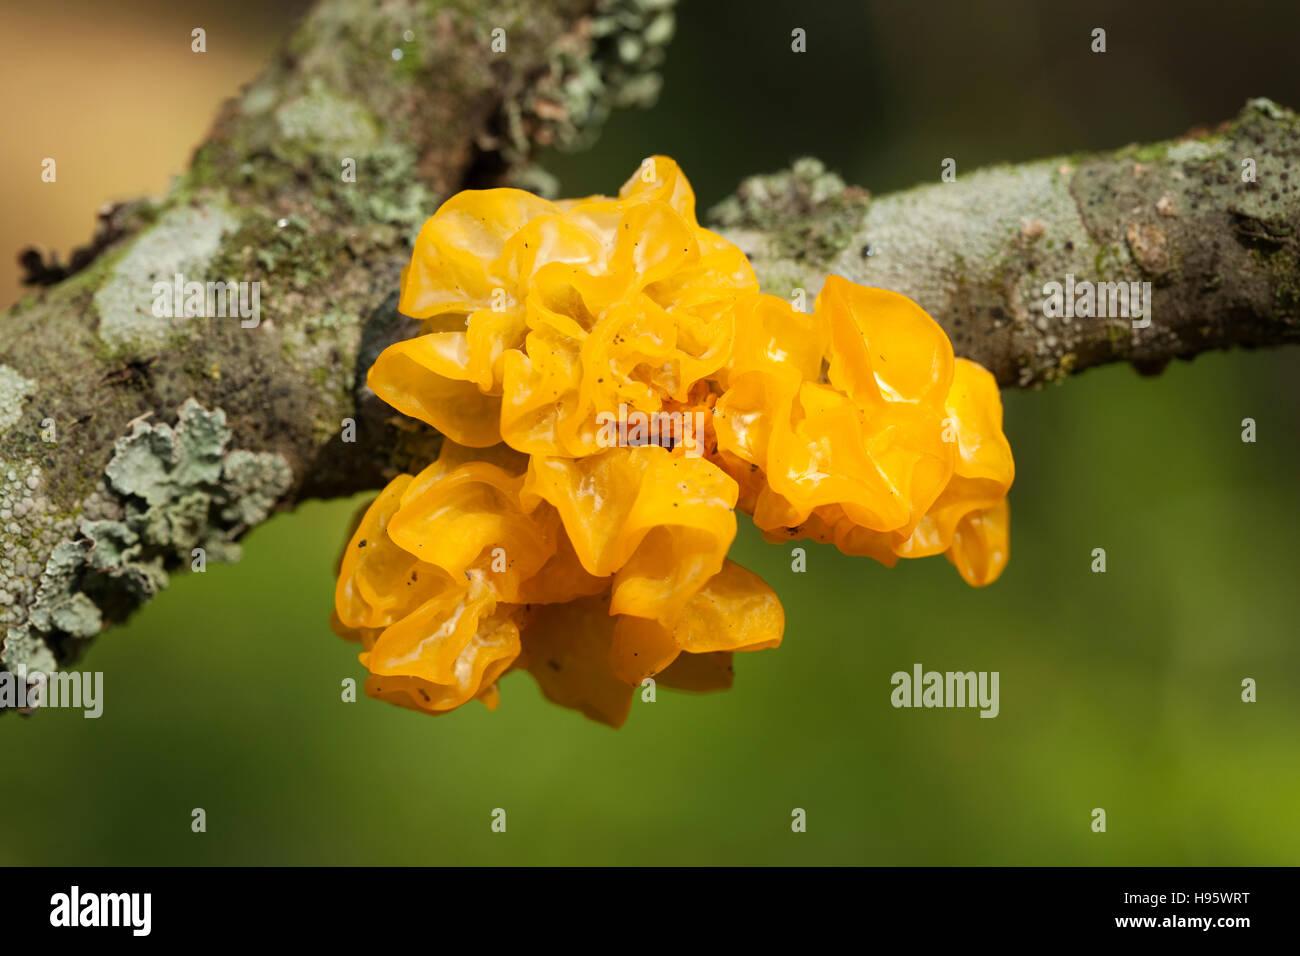 fungi with yellow gelatinous sporophores on branch - Stock Image